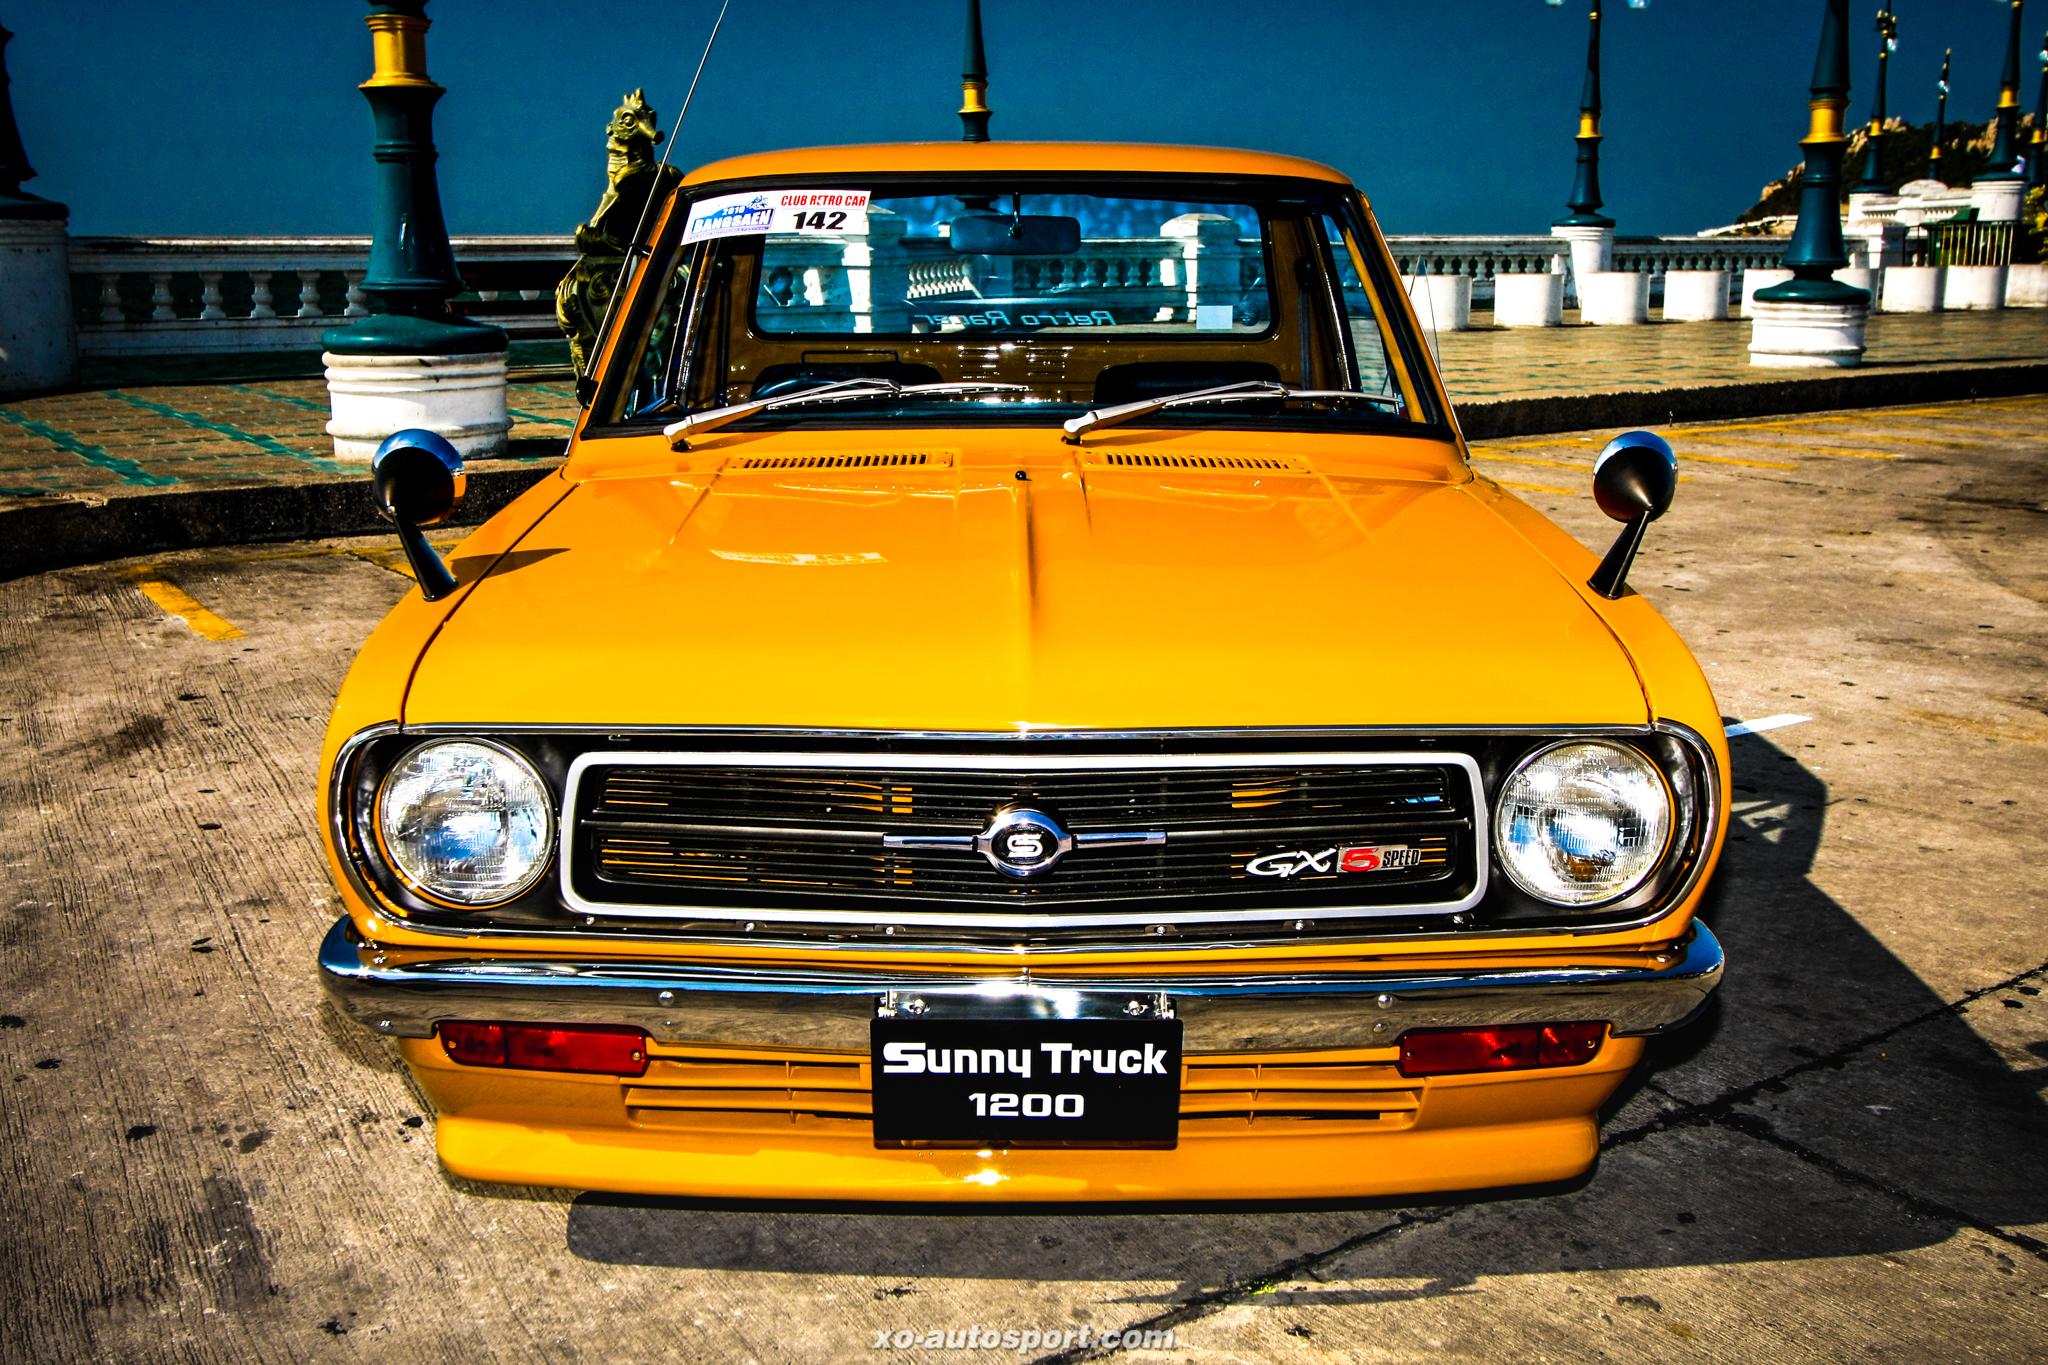 sunny truck 1200 03